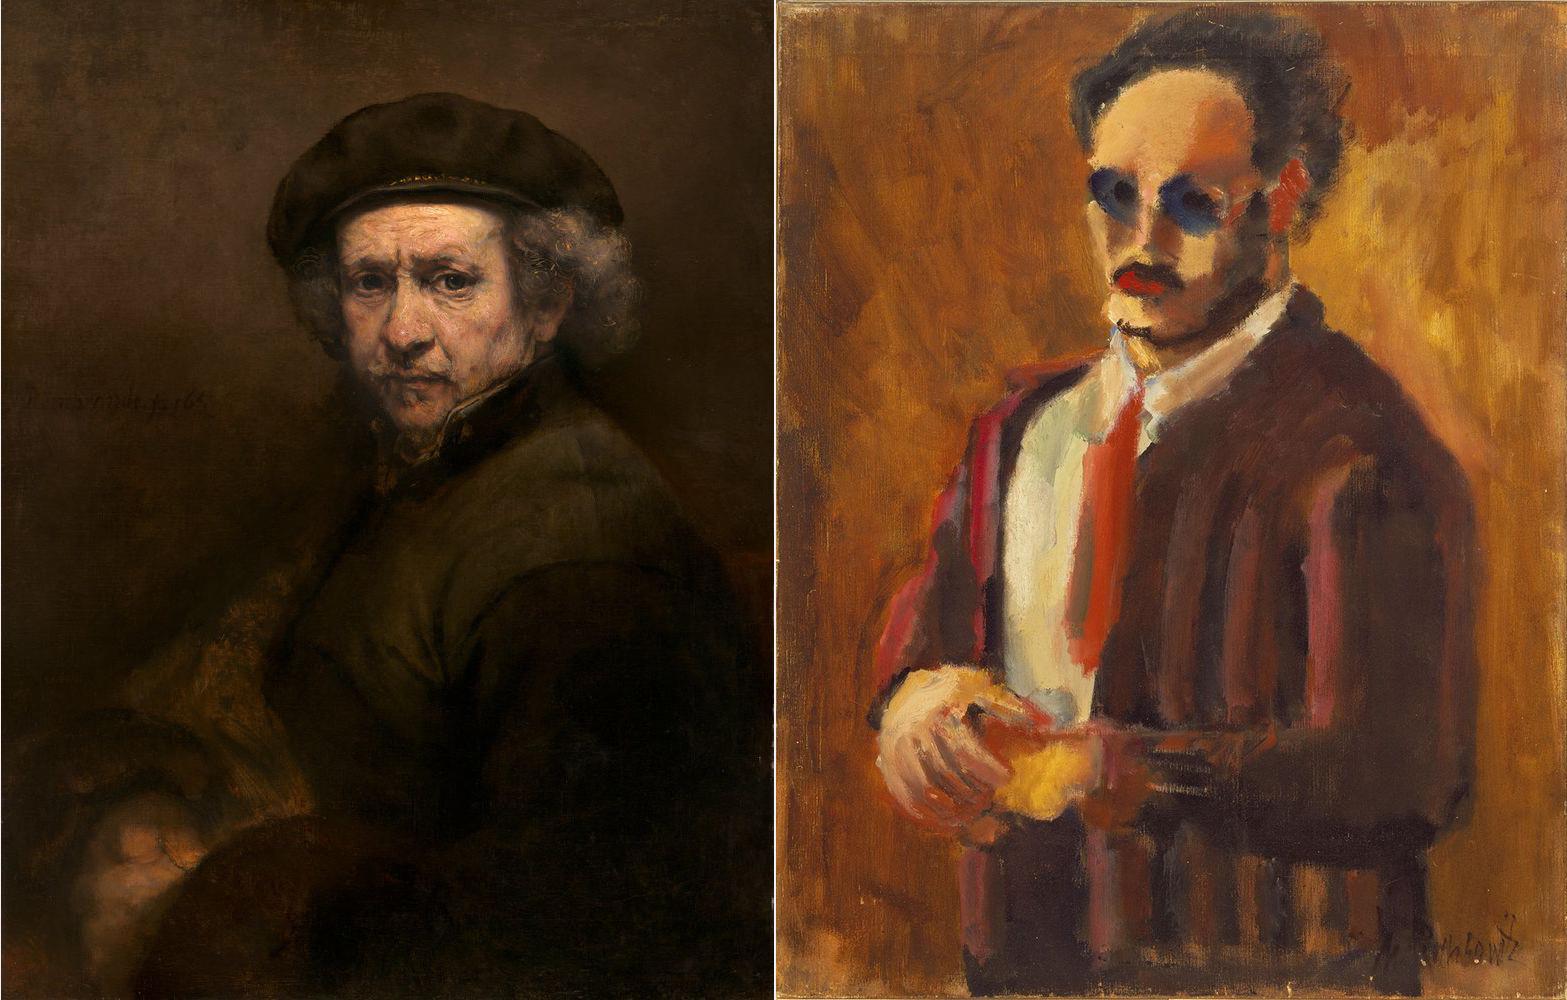 Рембрандт ван Рейн. Автопортрет, 1659, Марк Ротко. Автопортрет, 1936